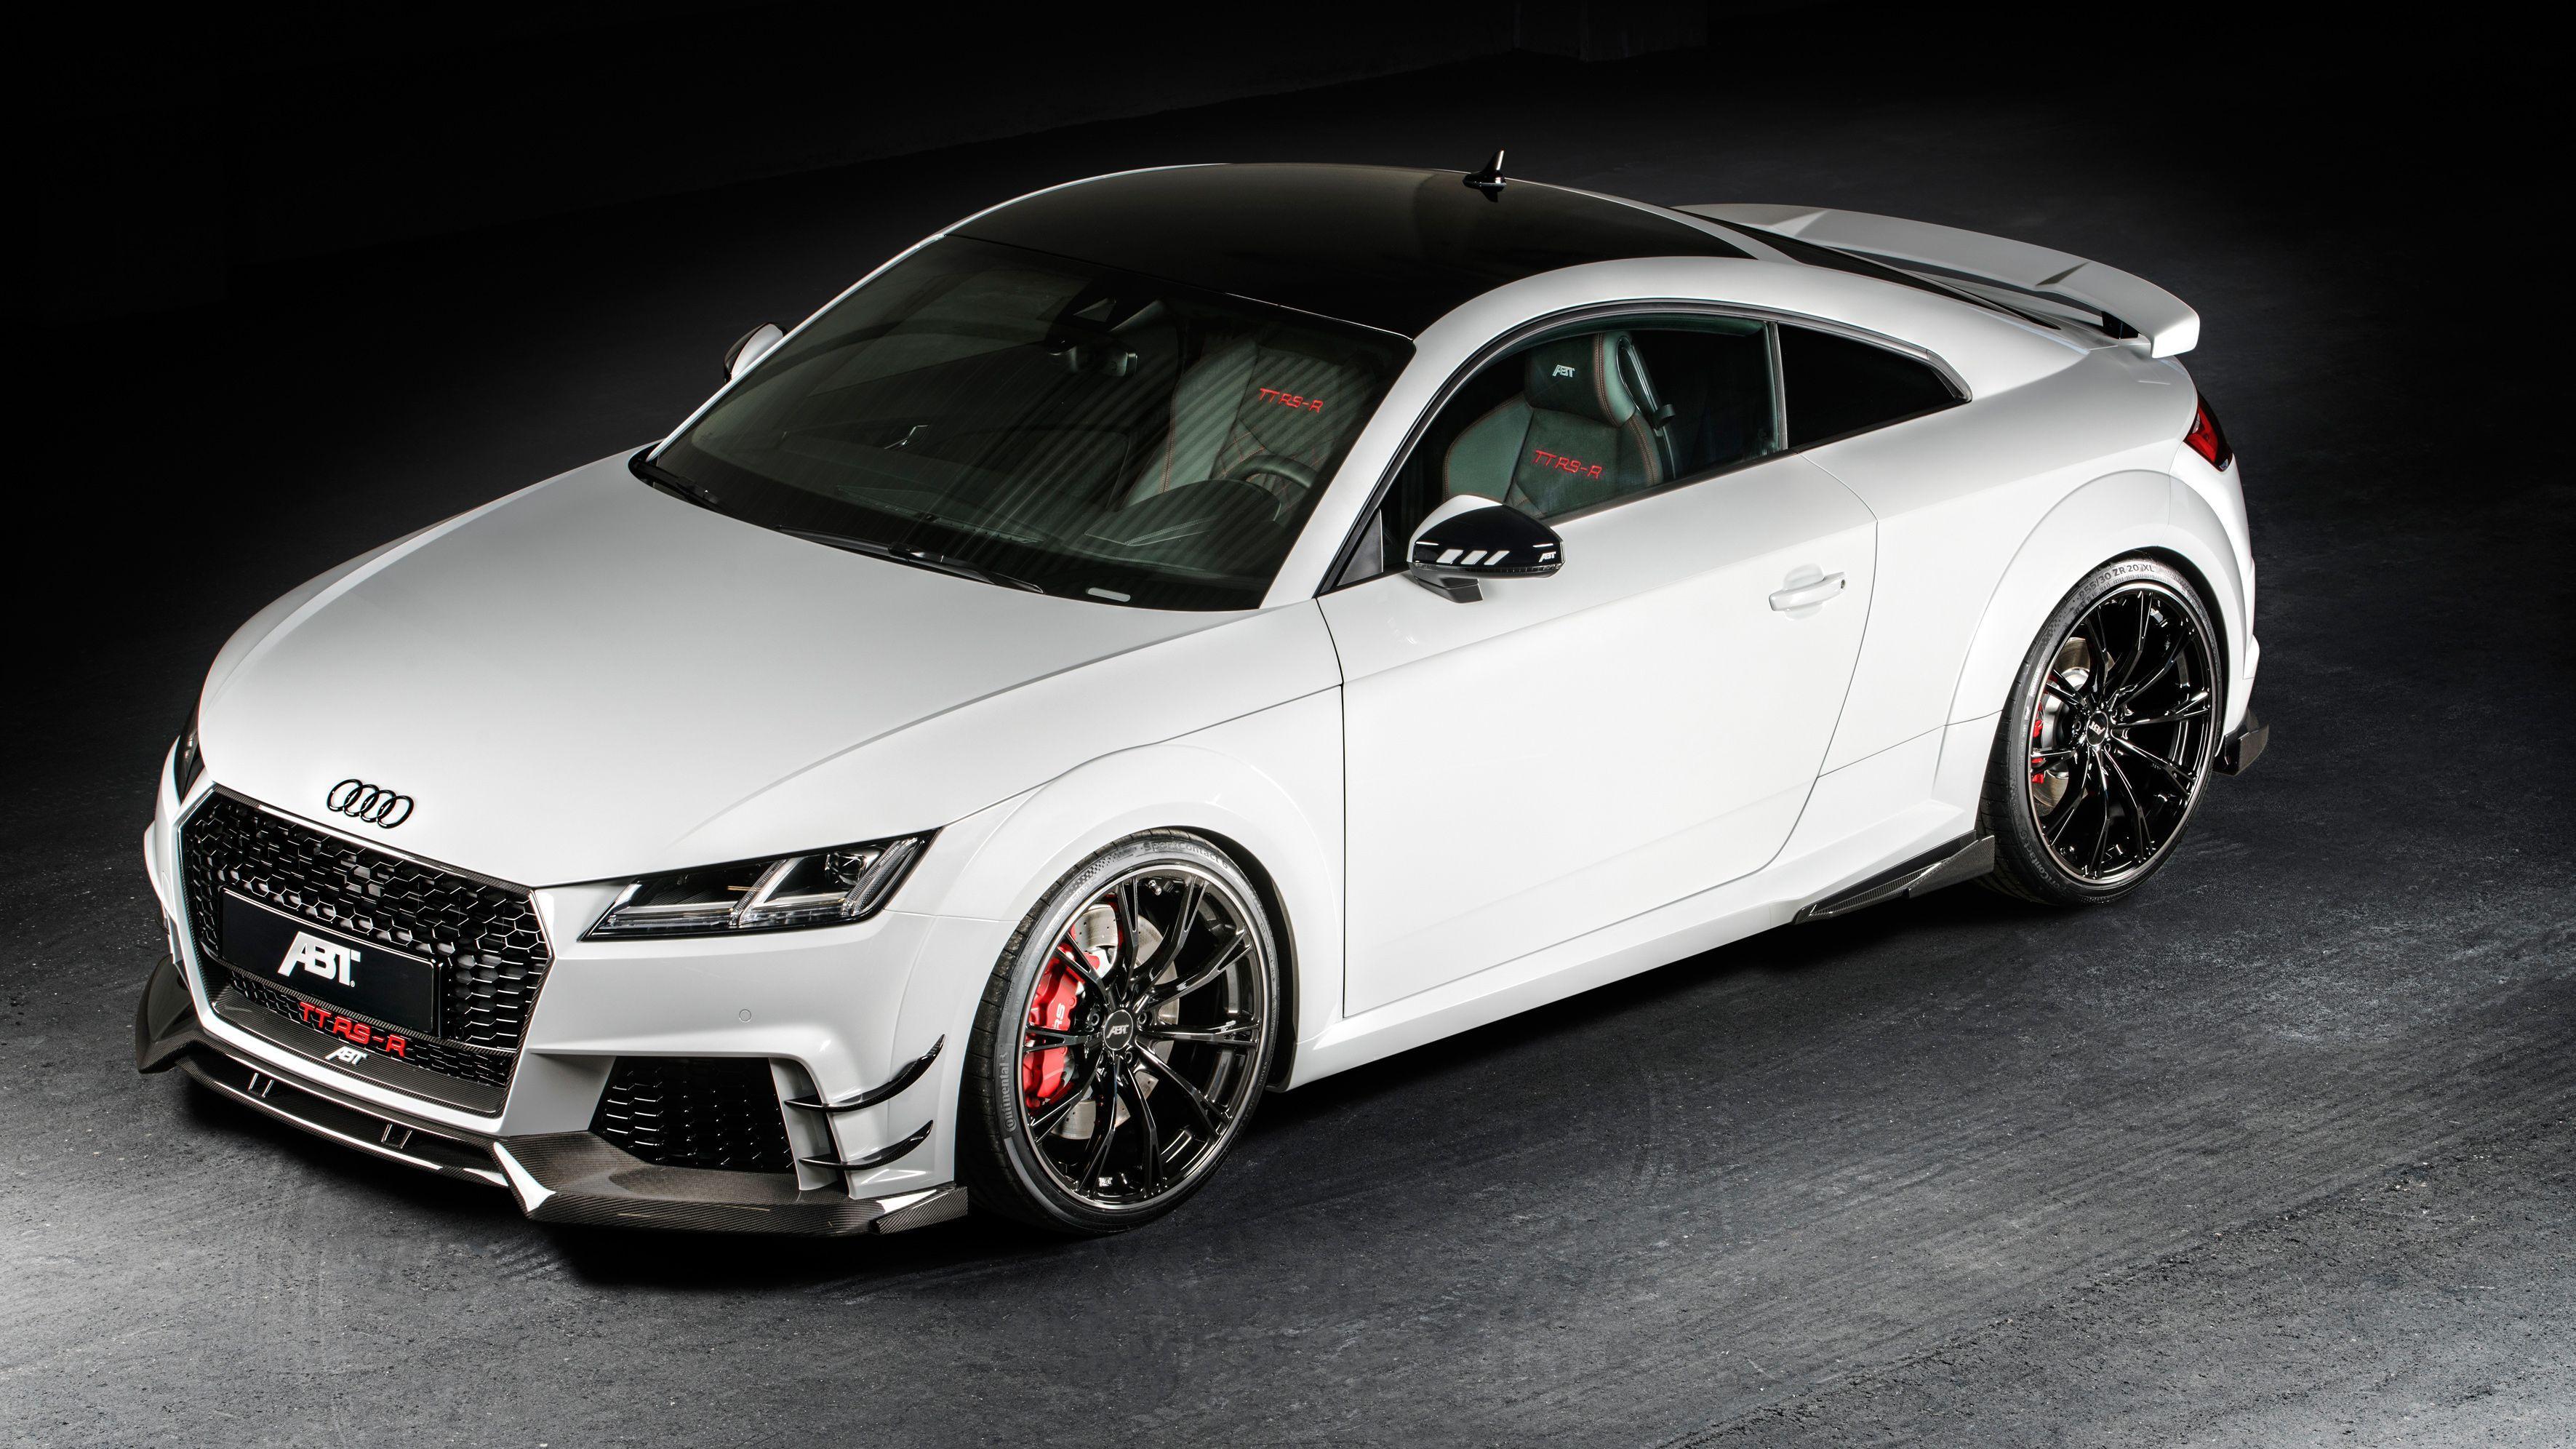 Audi Tt Rs Wallpapers Wallpaper Cave